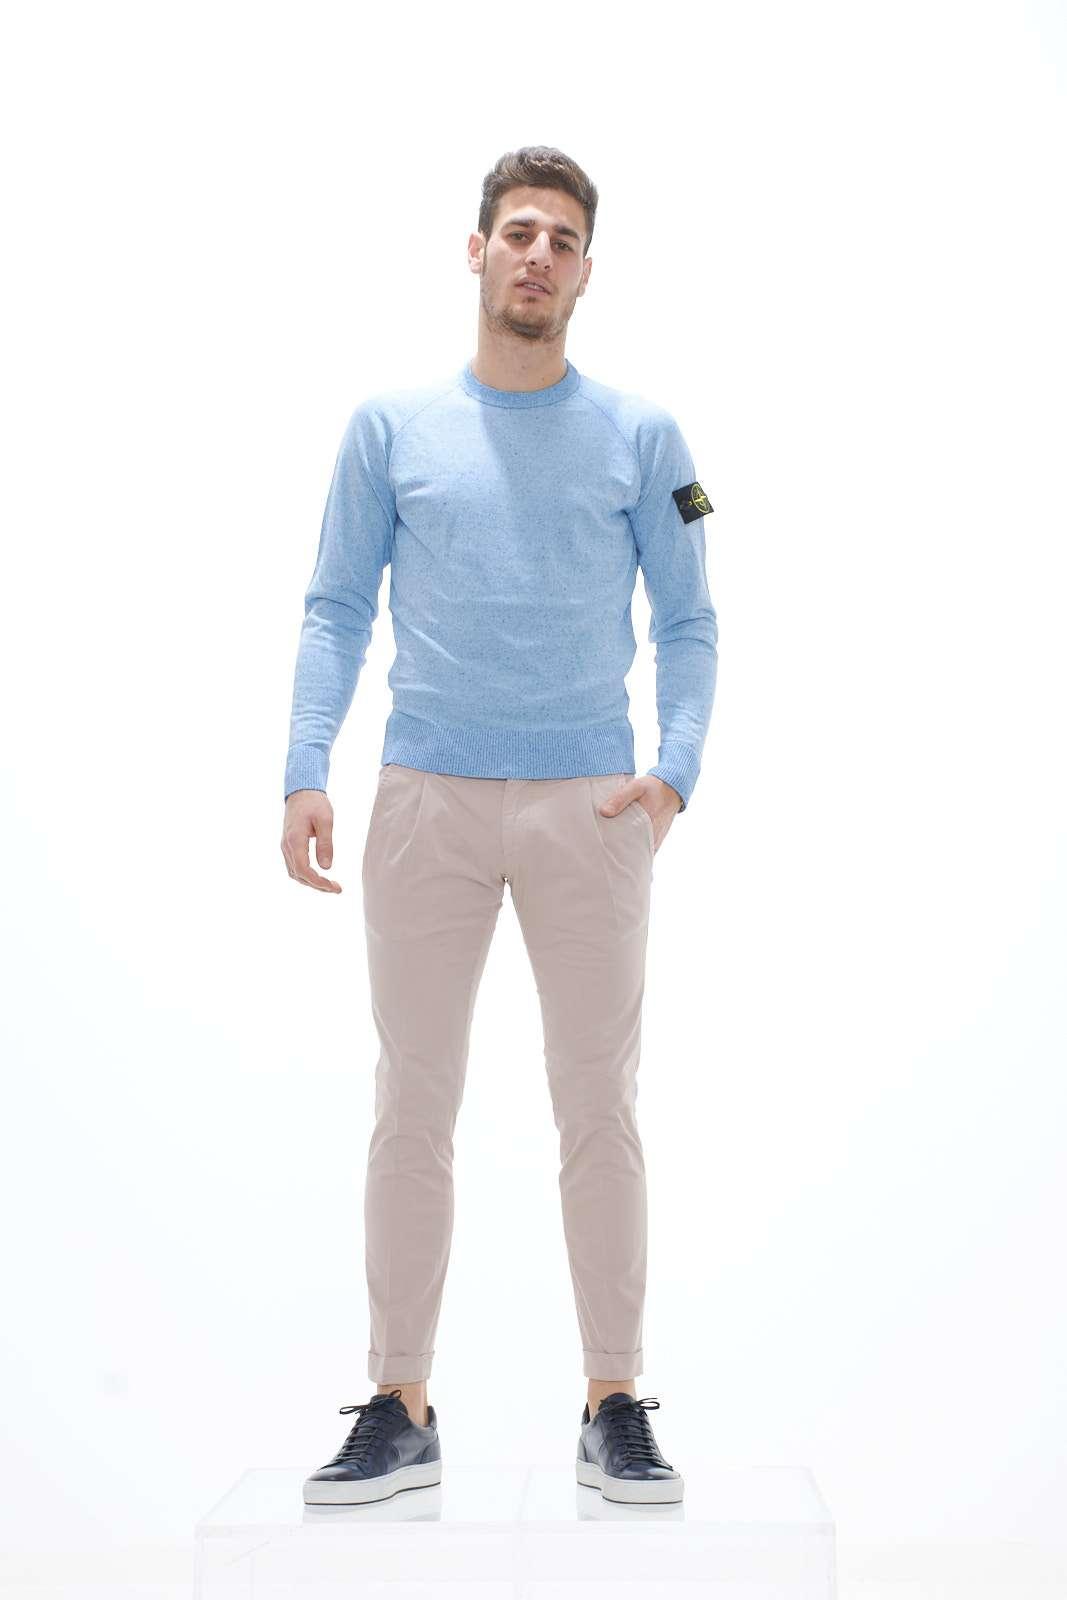 https://www.parmax.com/media/catalog/product/a/i/PE-outlet_parmax-pantaloni-uomo-Michael-Coal-FREDER2563-D.jpg